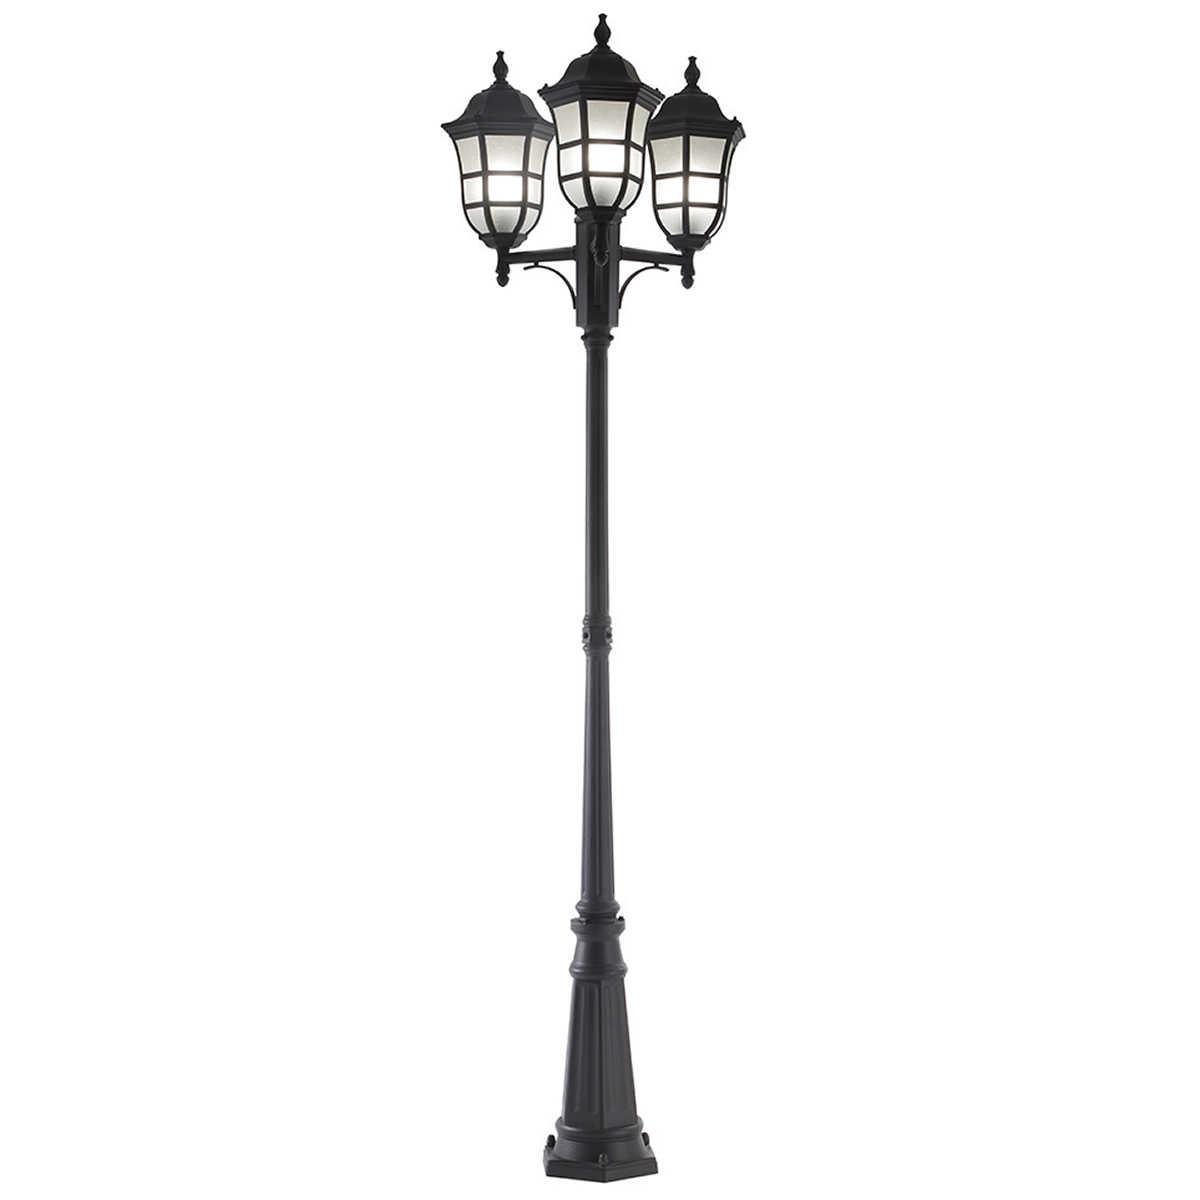 Wood outdoor lamp post - Ove Milton Iii Led Oversize Post Lamp